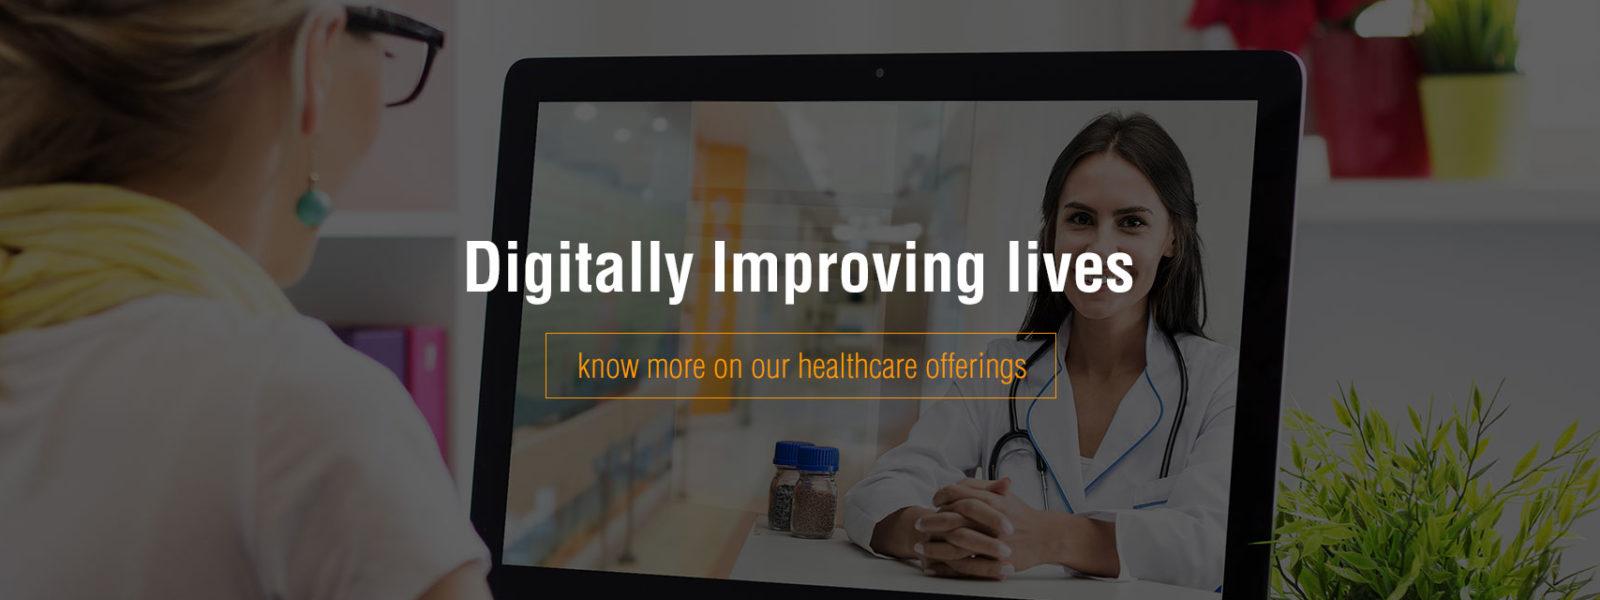 digitally-improving-lives